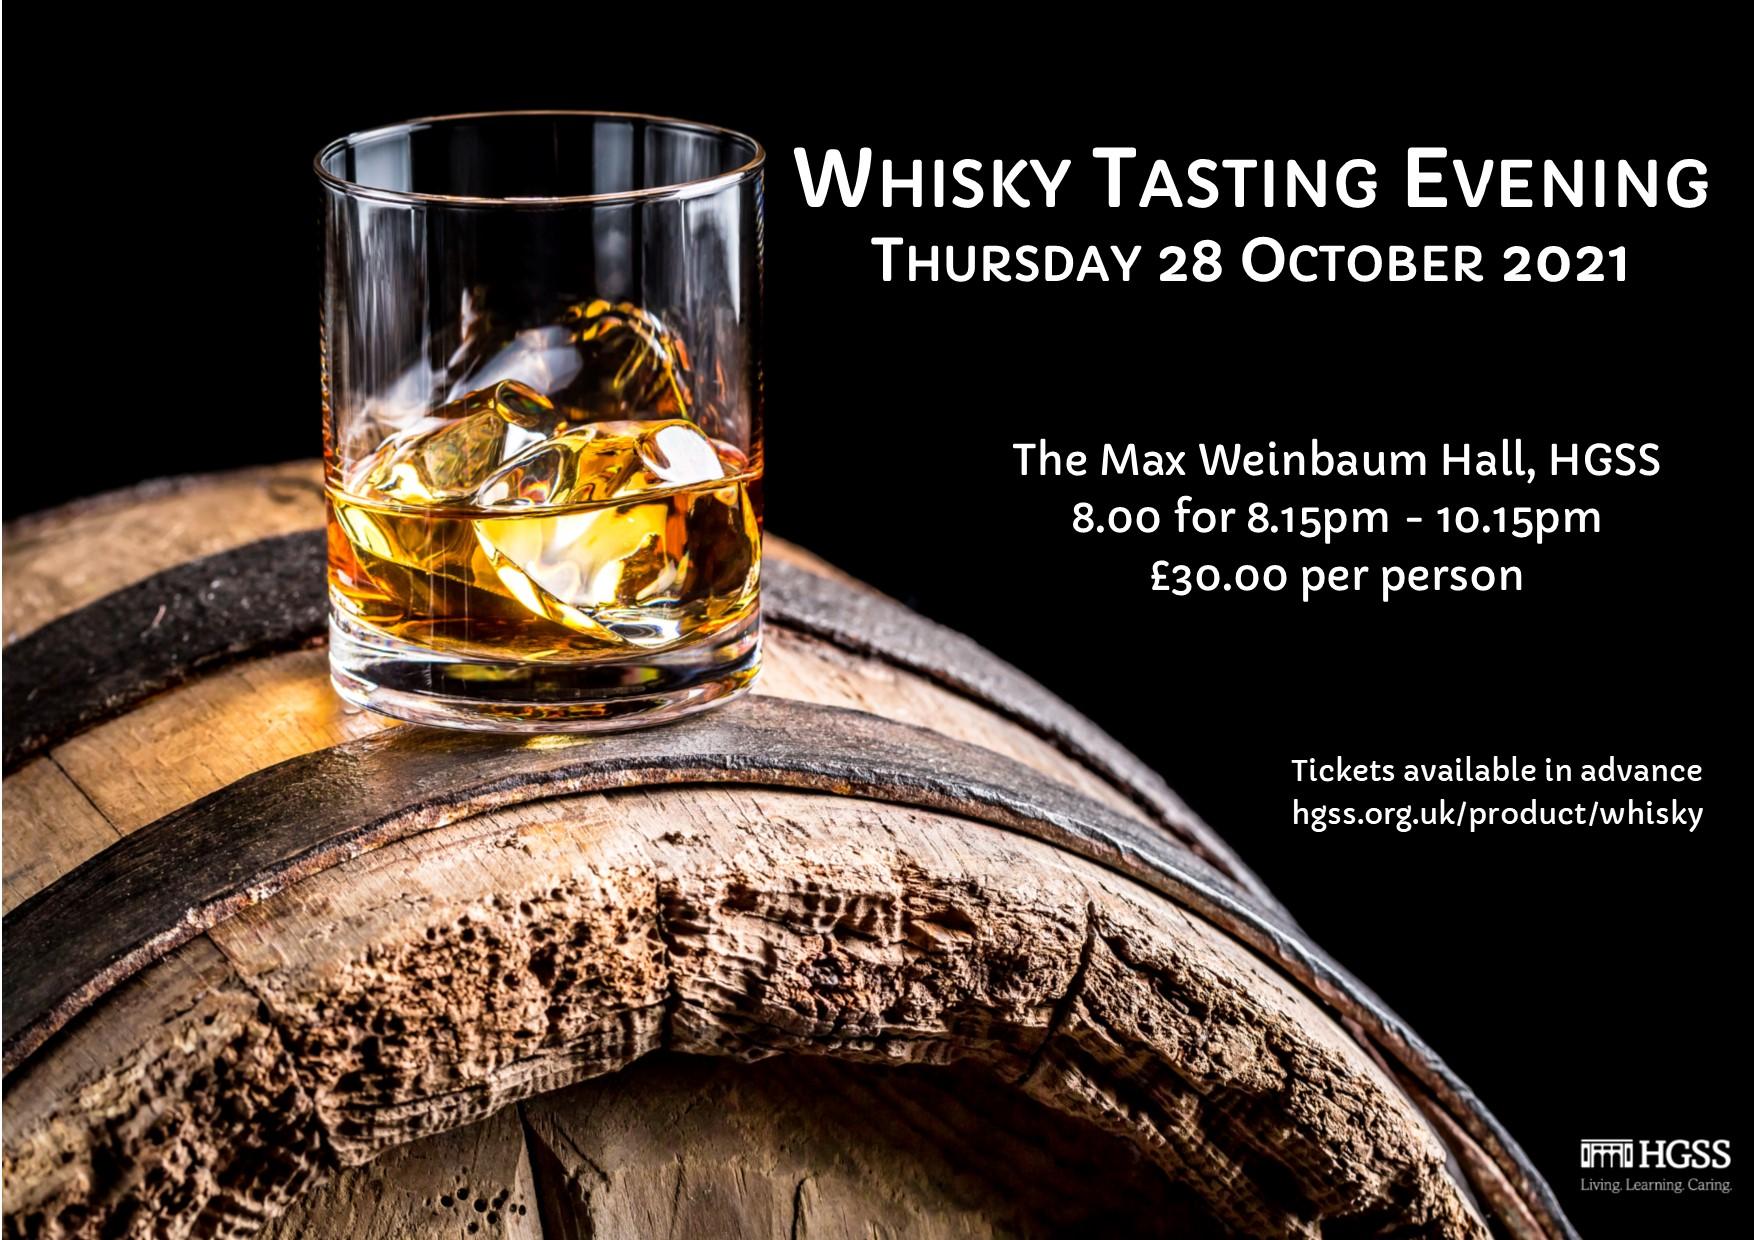 HGSS Whisky Tasting Evening @ The Max Weinbaum Hall